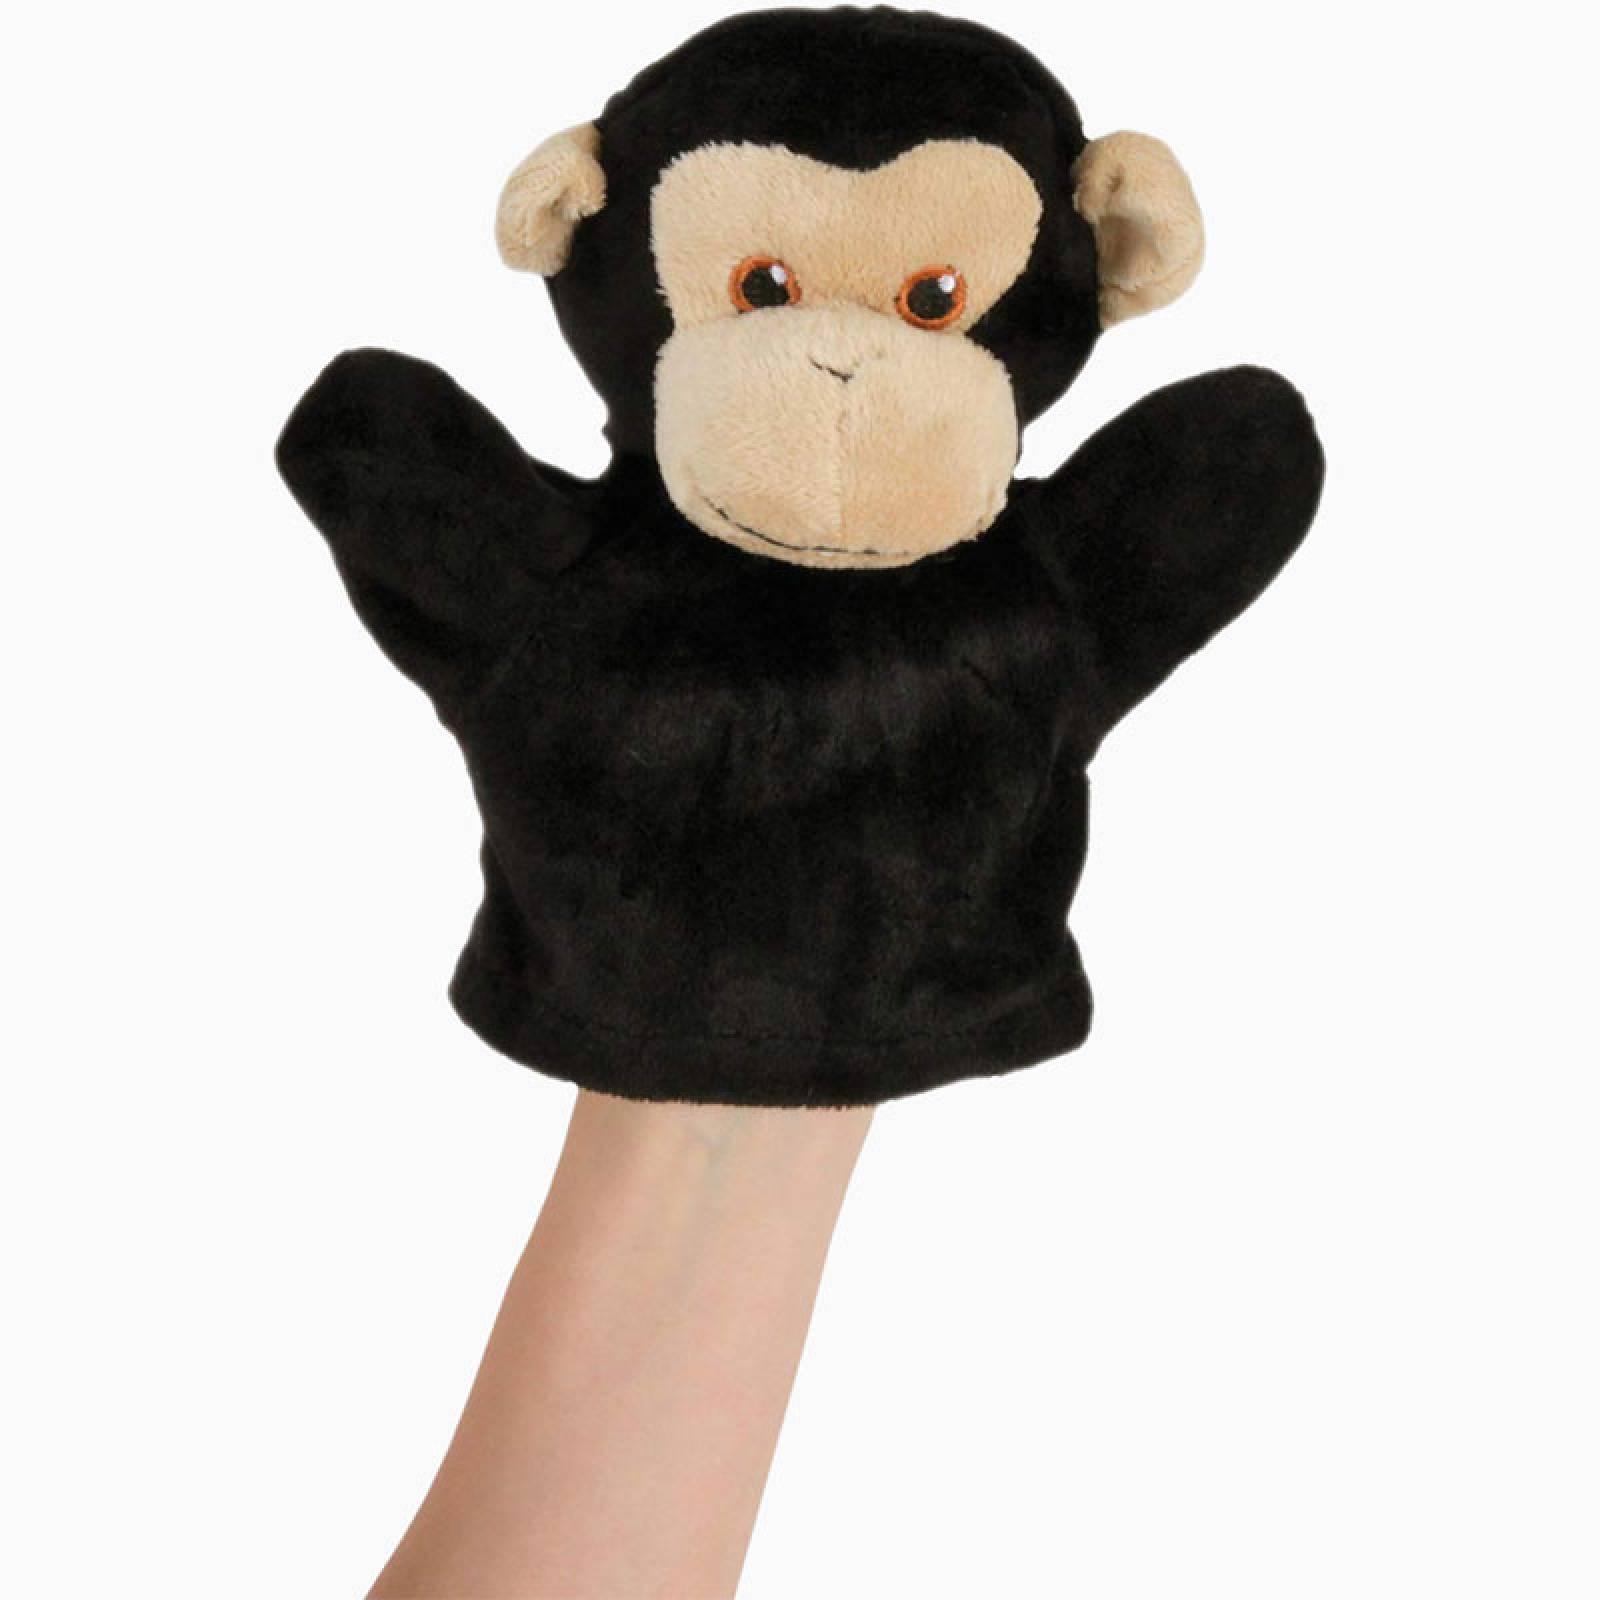 Chimp - My First Puppet 0+